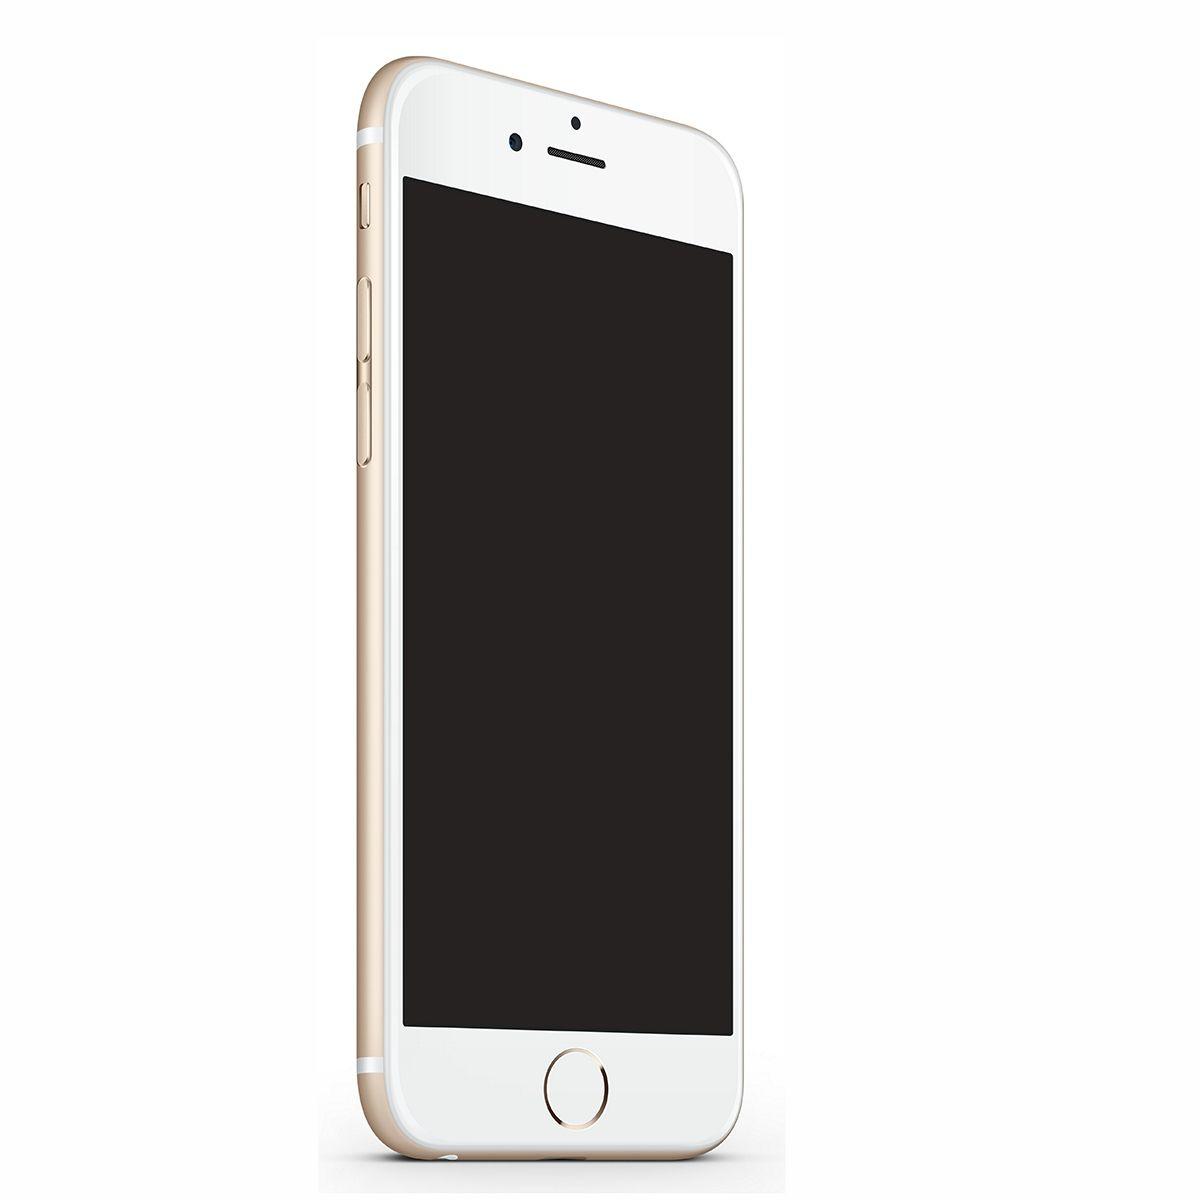 comprar iphone se 64gb a contrareembolso